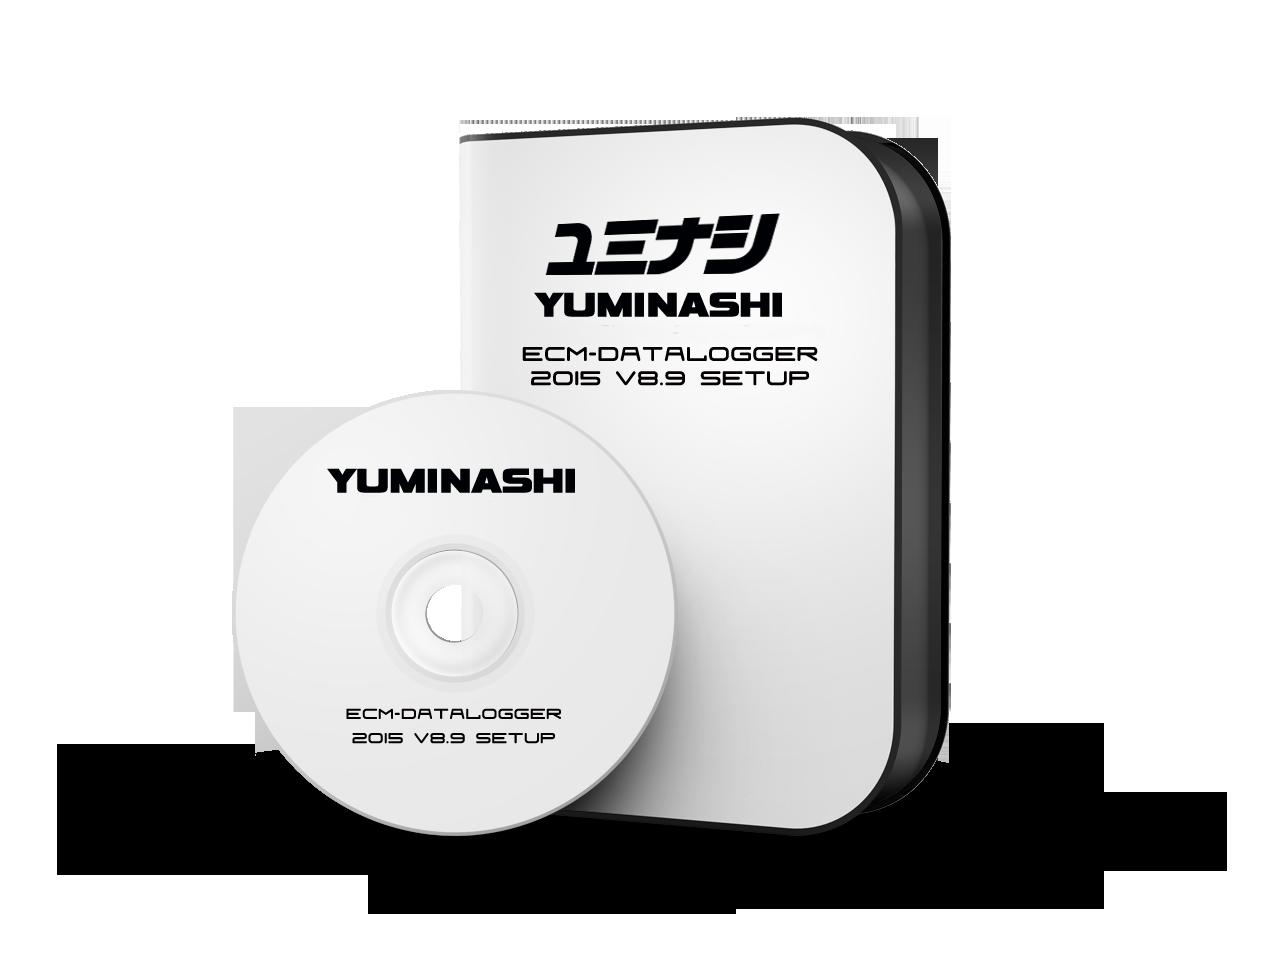 02b-yuminashi-ecm-datalogger-v8.9-setup-vector.png